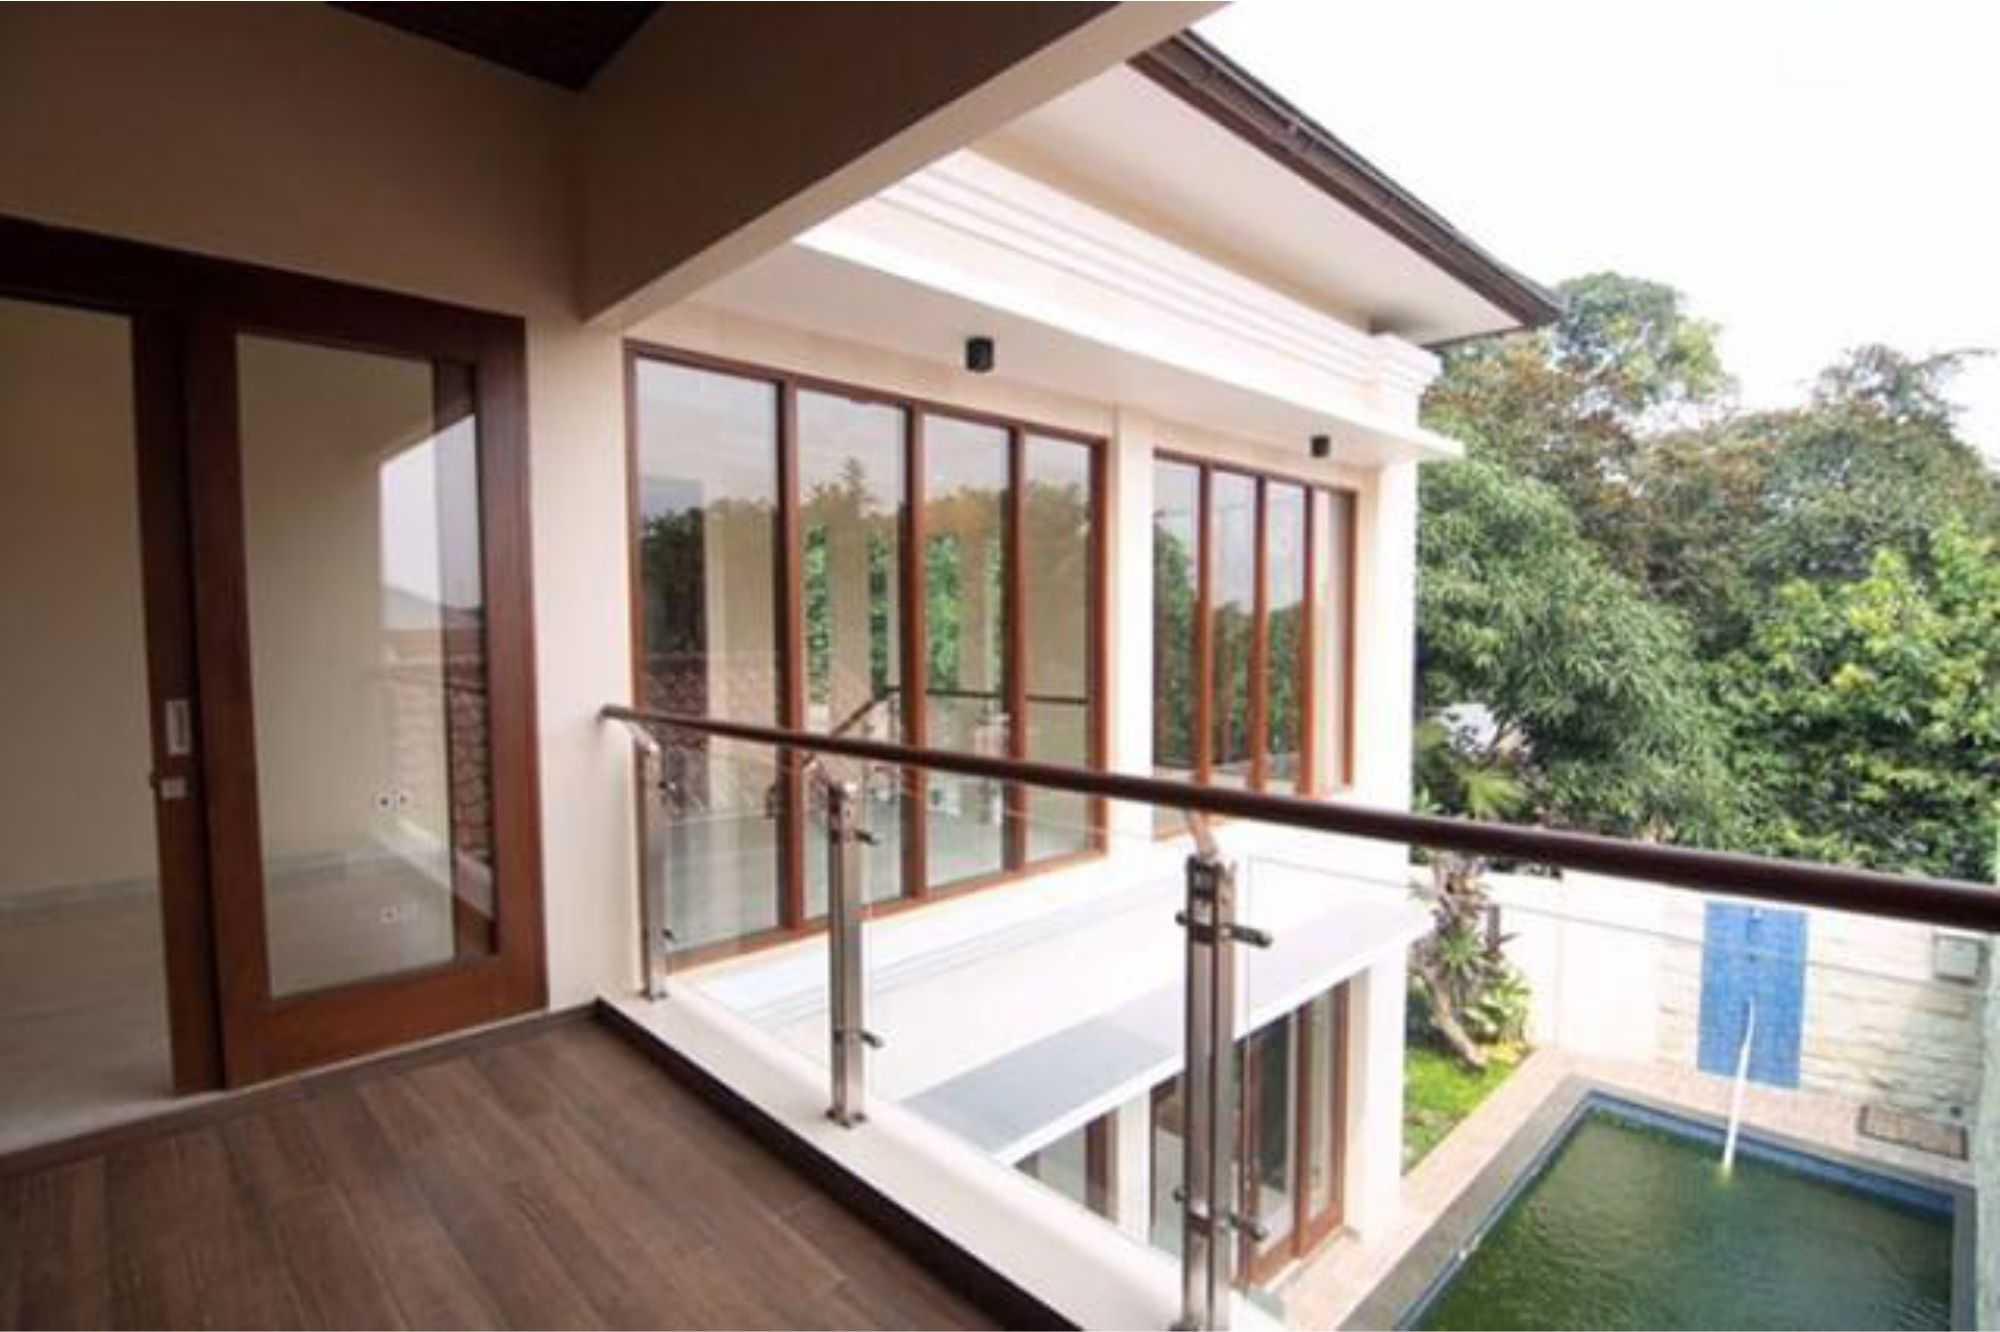 Emporio Architect Progress Konstruksi Rumah Villa Bali Tropis 385 @ Jakarta Jakarta, Daerah Khusus Ibukota Jakarta, Indonesia Jakarta, Daerah Khusus Ibukota Jakarta, Indonesia Emporio-Architect-Progress-Konstruksi-Rumah-Villa-Bali-Tropis-385-Jakarta  76584